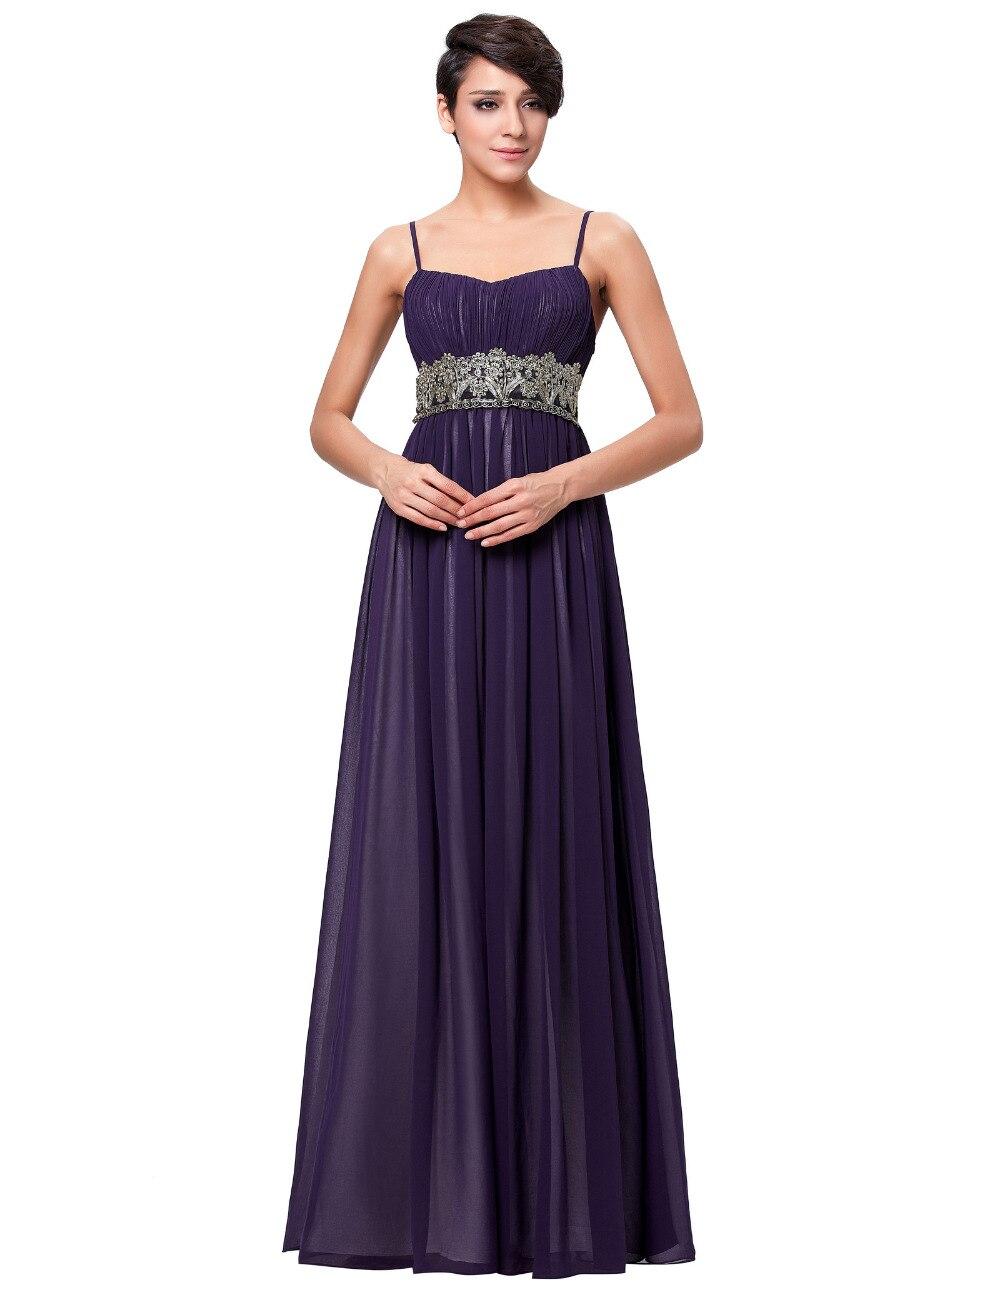 Online get cheap guava bridesmaid dresses aliexpress green purple bridesmaid dresses long chiffon spaghetti strap prom formal gown floor length applique bride maids ombrellifo Gallery